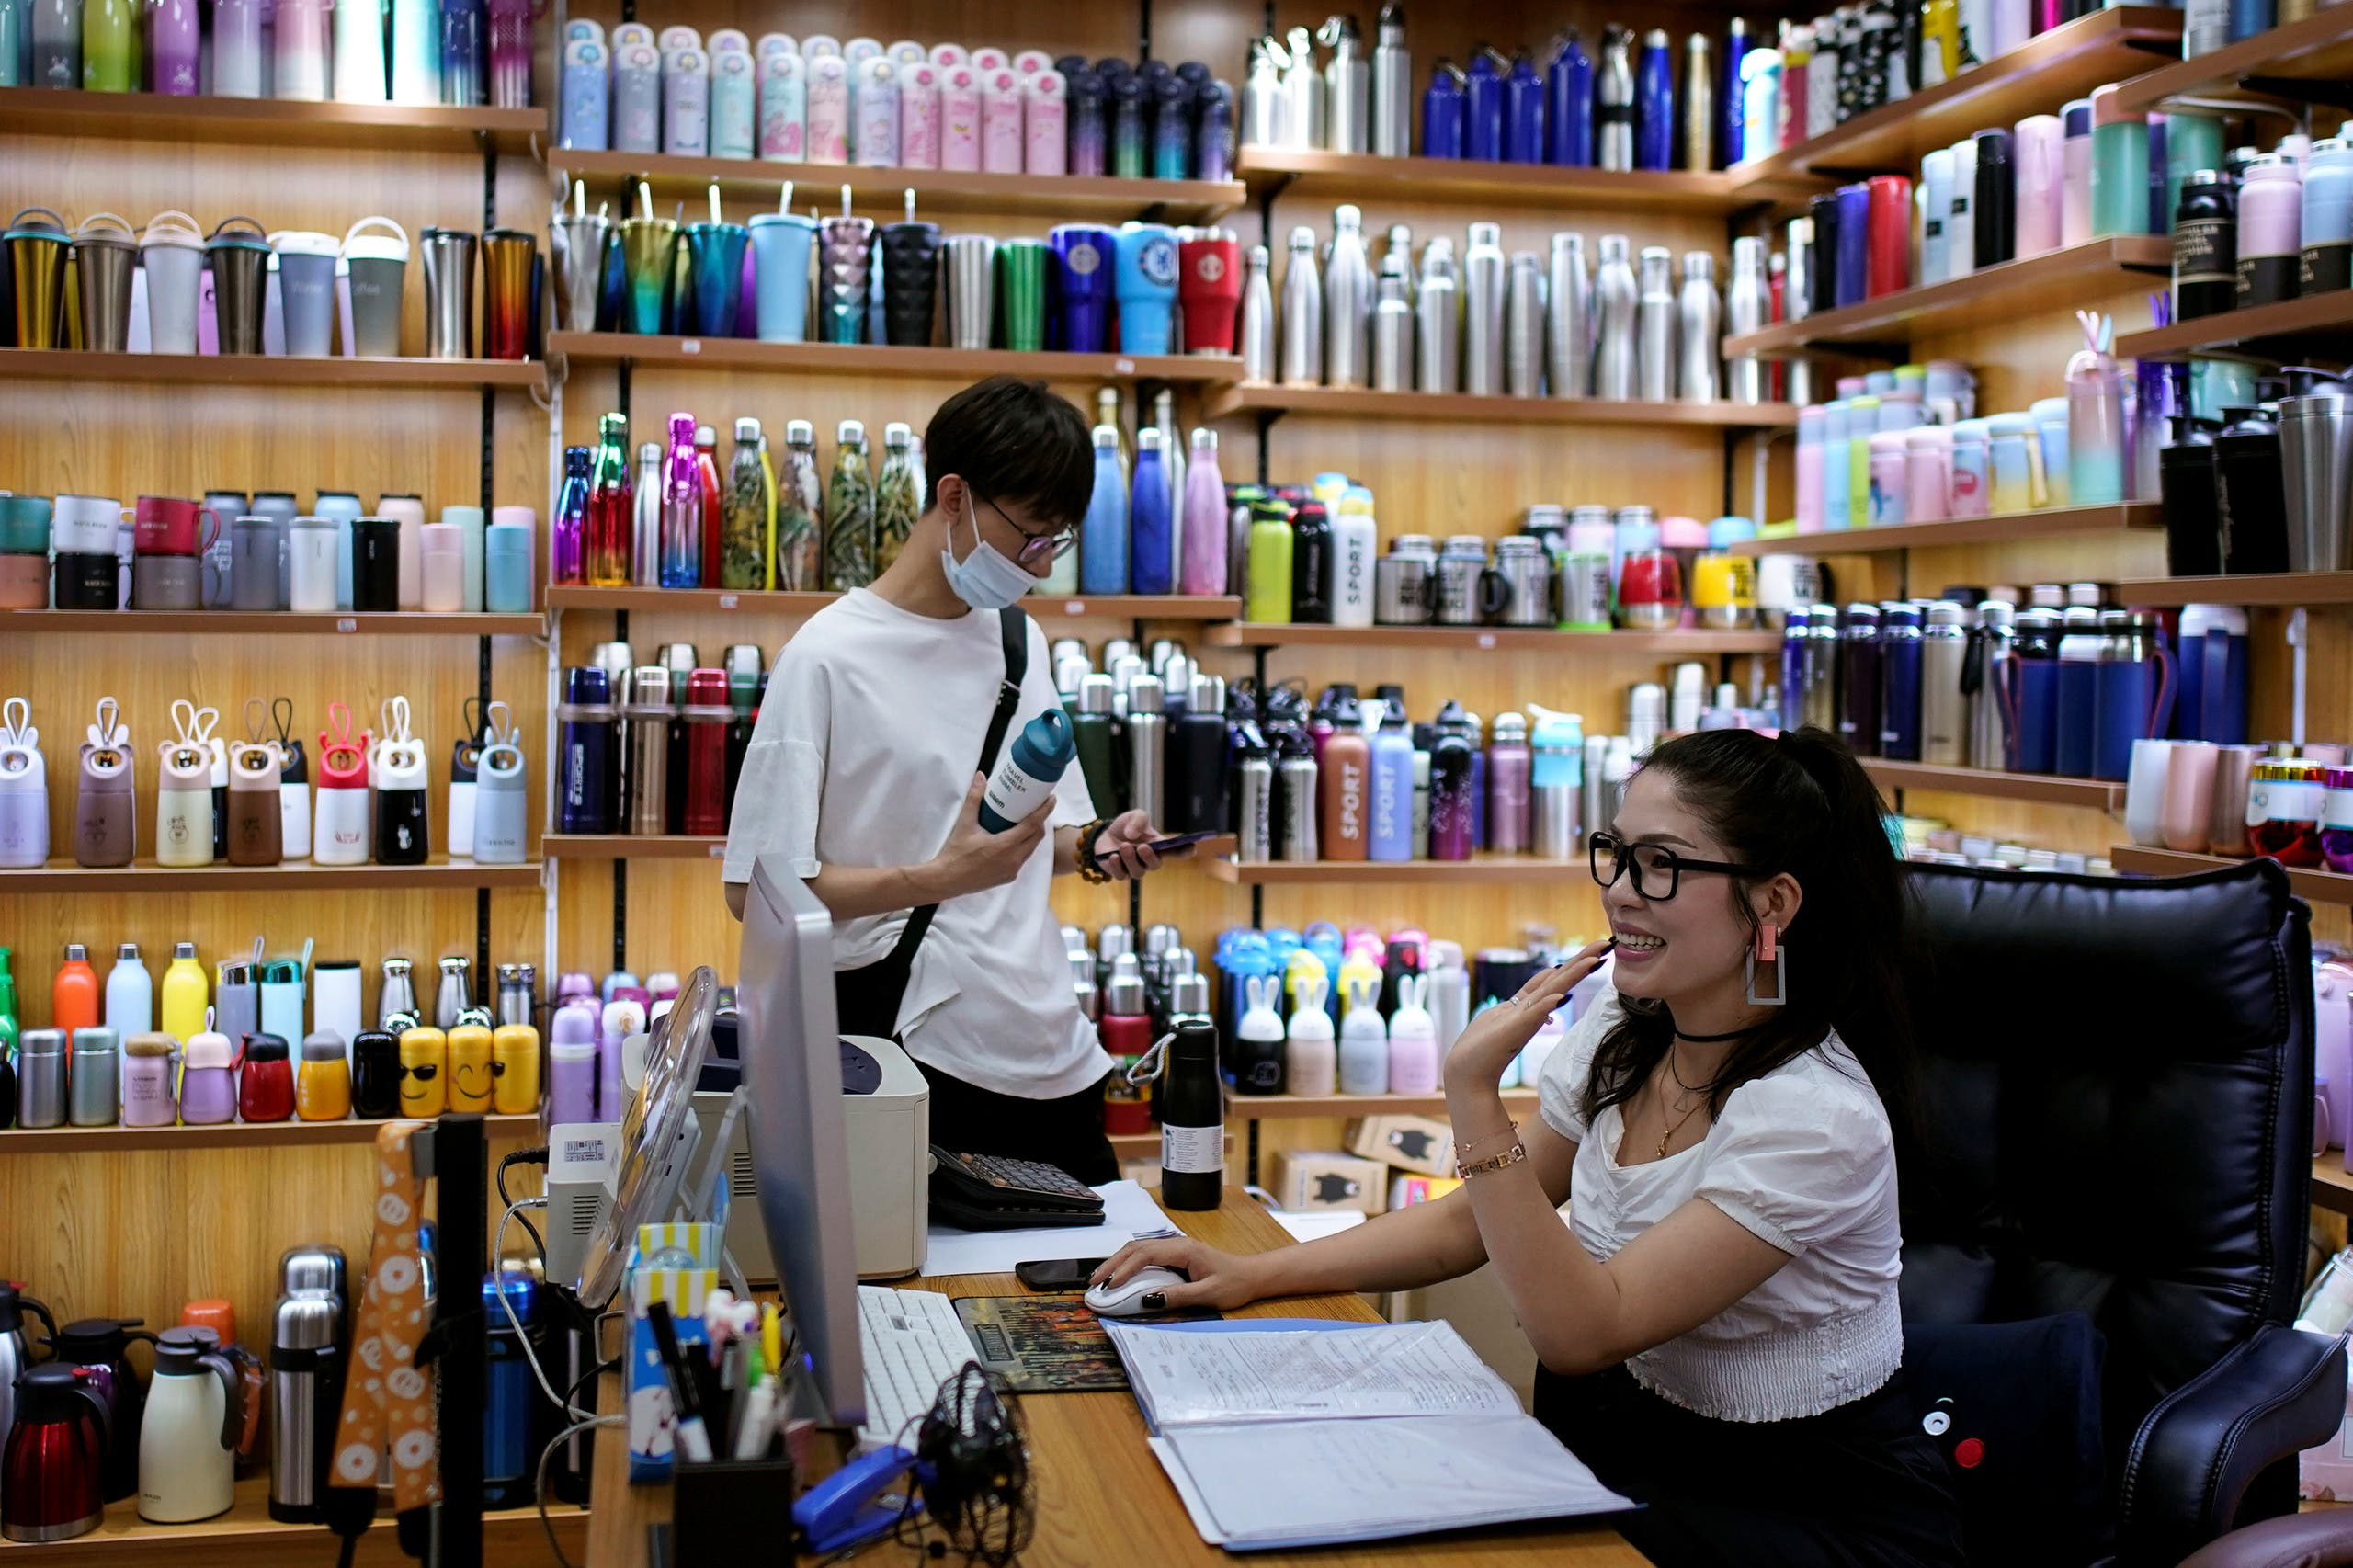 Deng Jinling, manager of Lucky Bird Trade Co. checks her online store in Yiwu, Zhejiang province, China June 2, 2020. (Reuters)